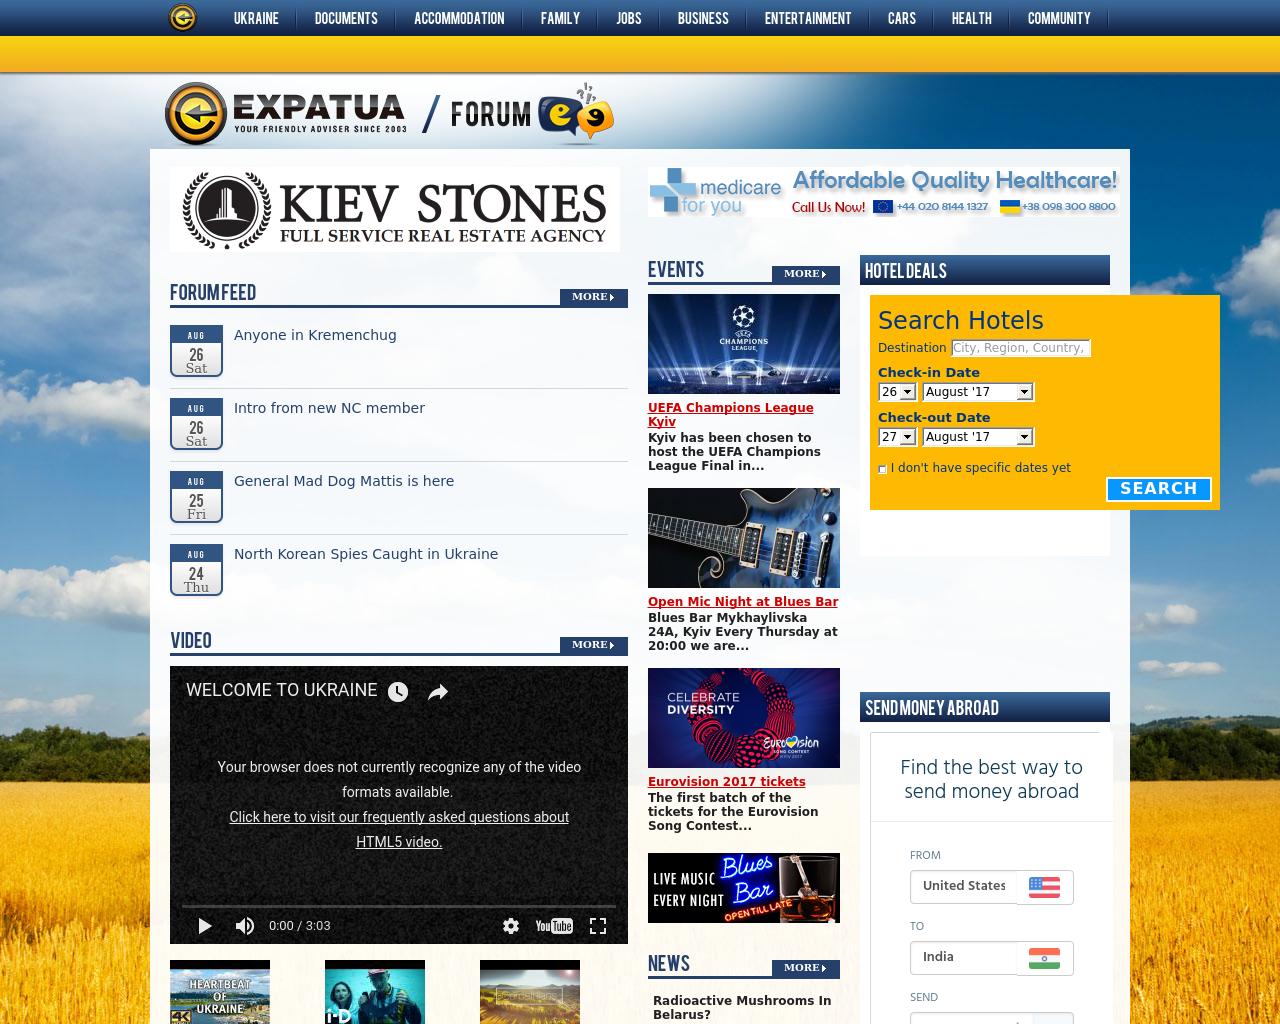 Expat-Ukraine-Advertising-Reviews-Pricing